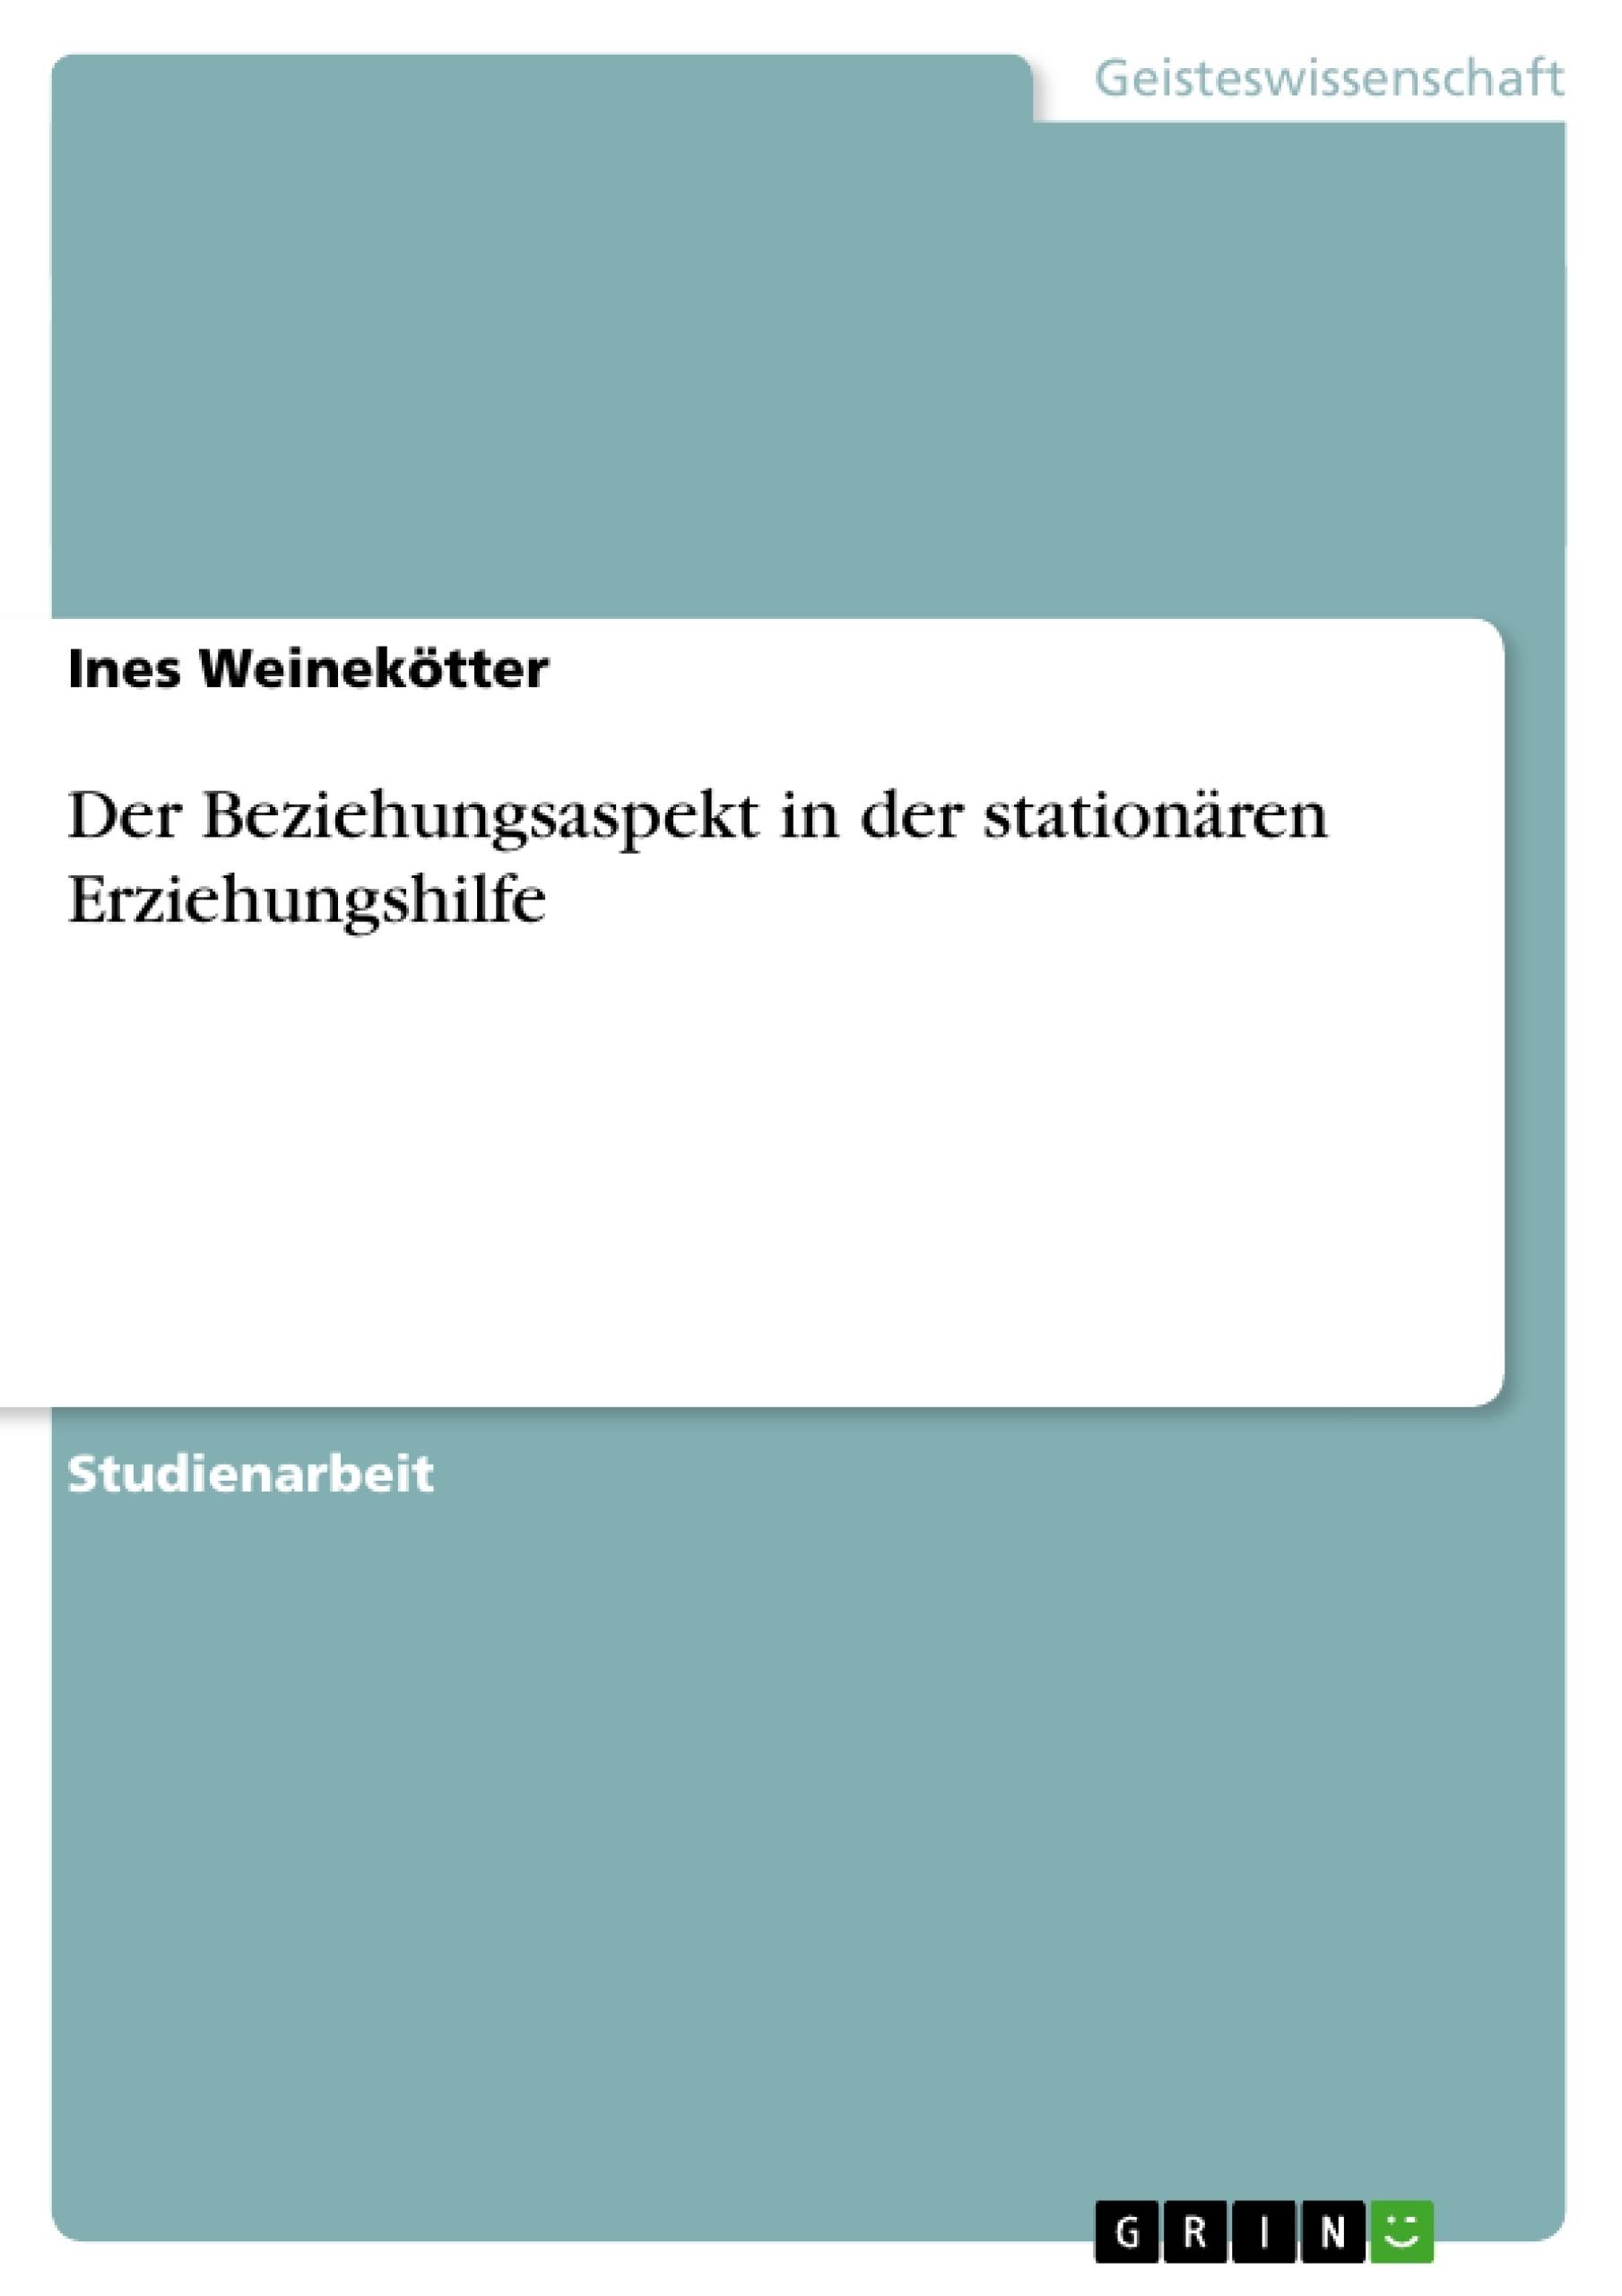 Titel: Der Beziehungsaspekt in der stationären Erziehungshilfe